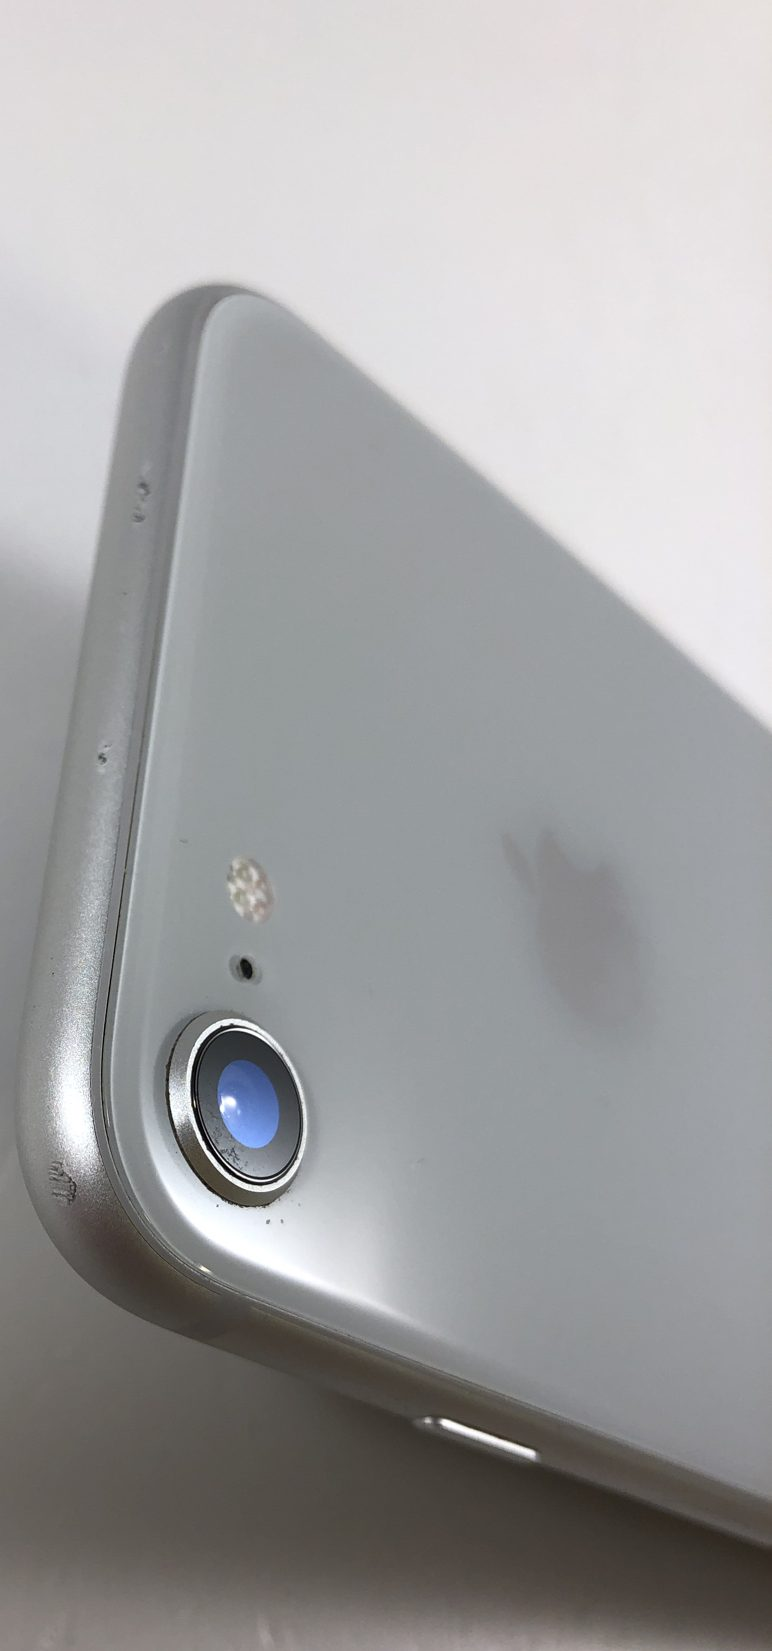 iPhone 8 64GB, 64GB, Silver, obraz 3